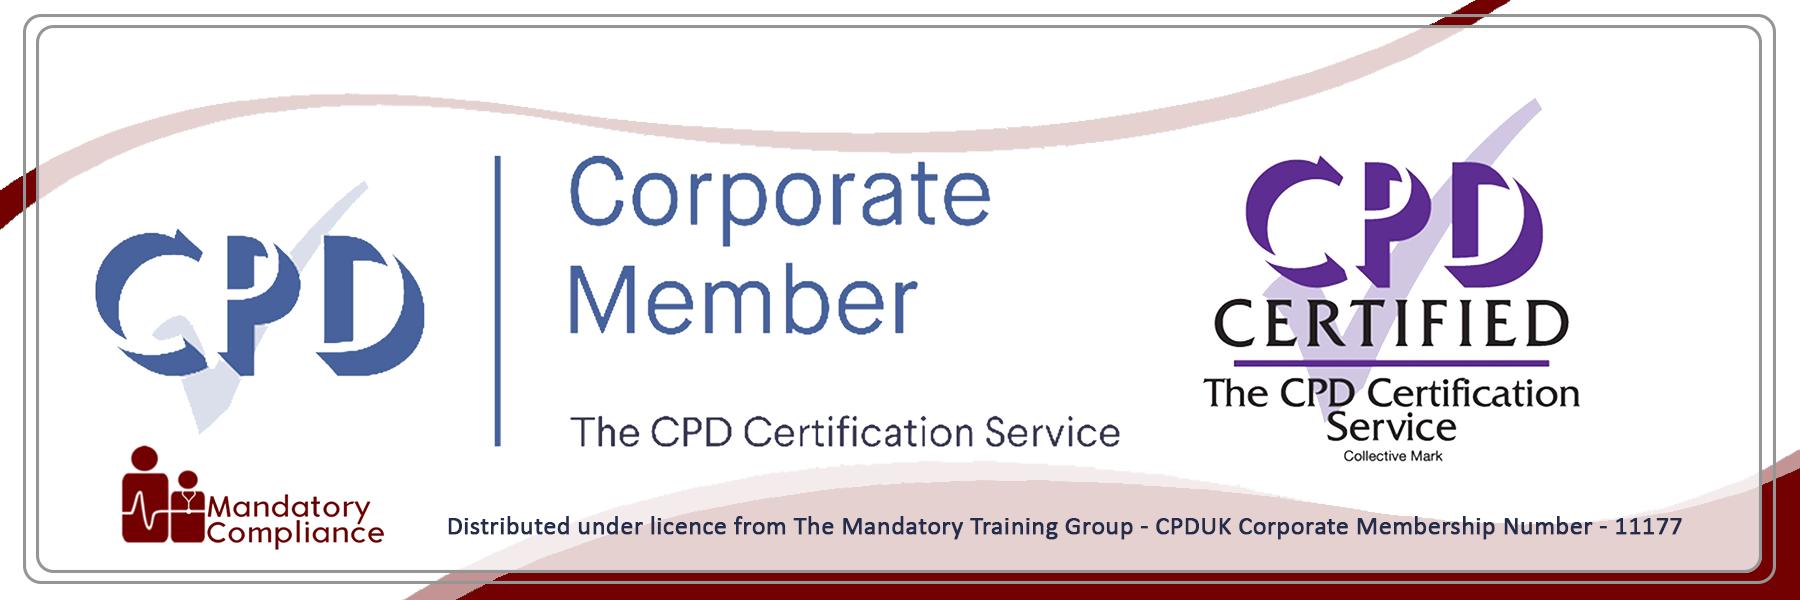 Cyber Security Training - E-Learning Courses - Mandatory Compliance UK -